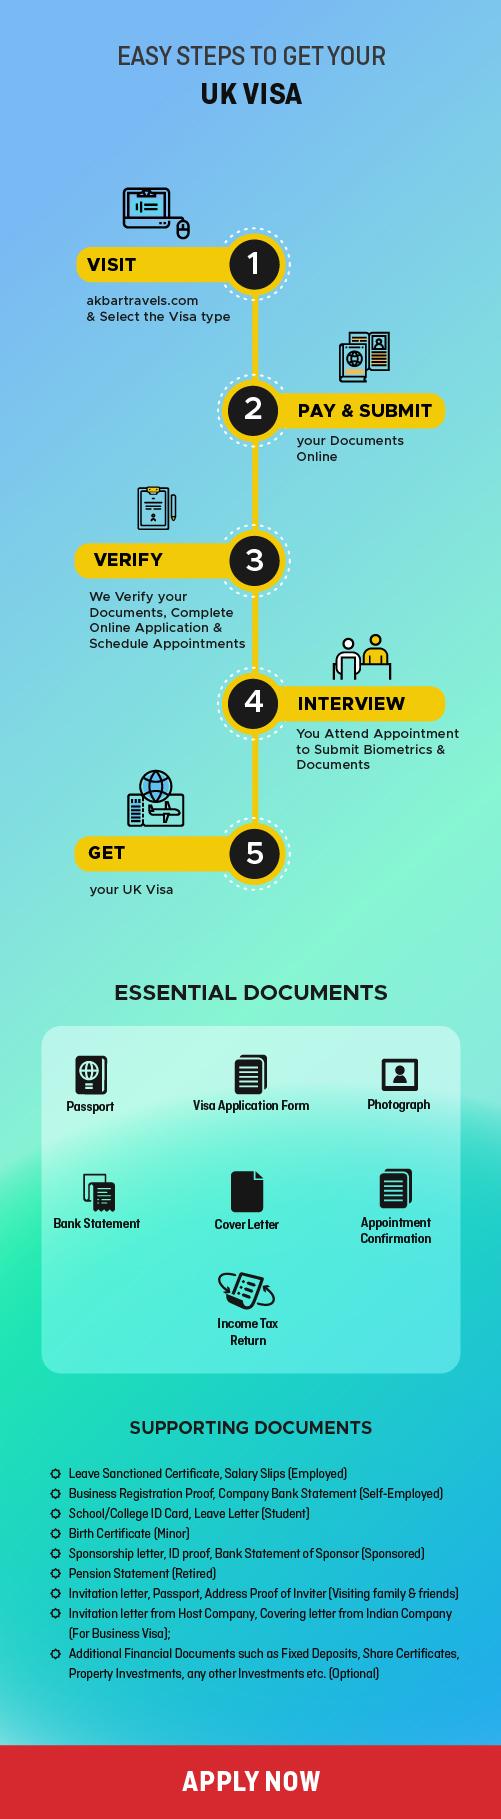 Steps to get UK Visa